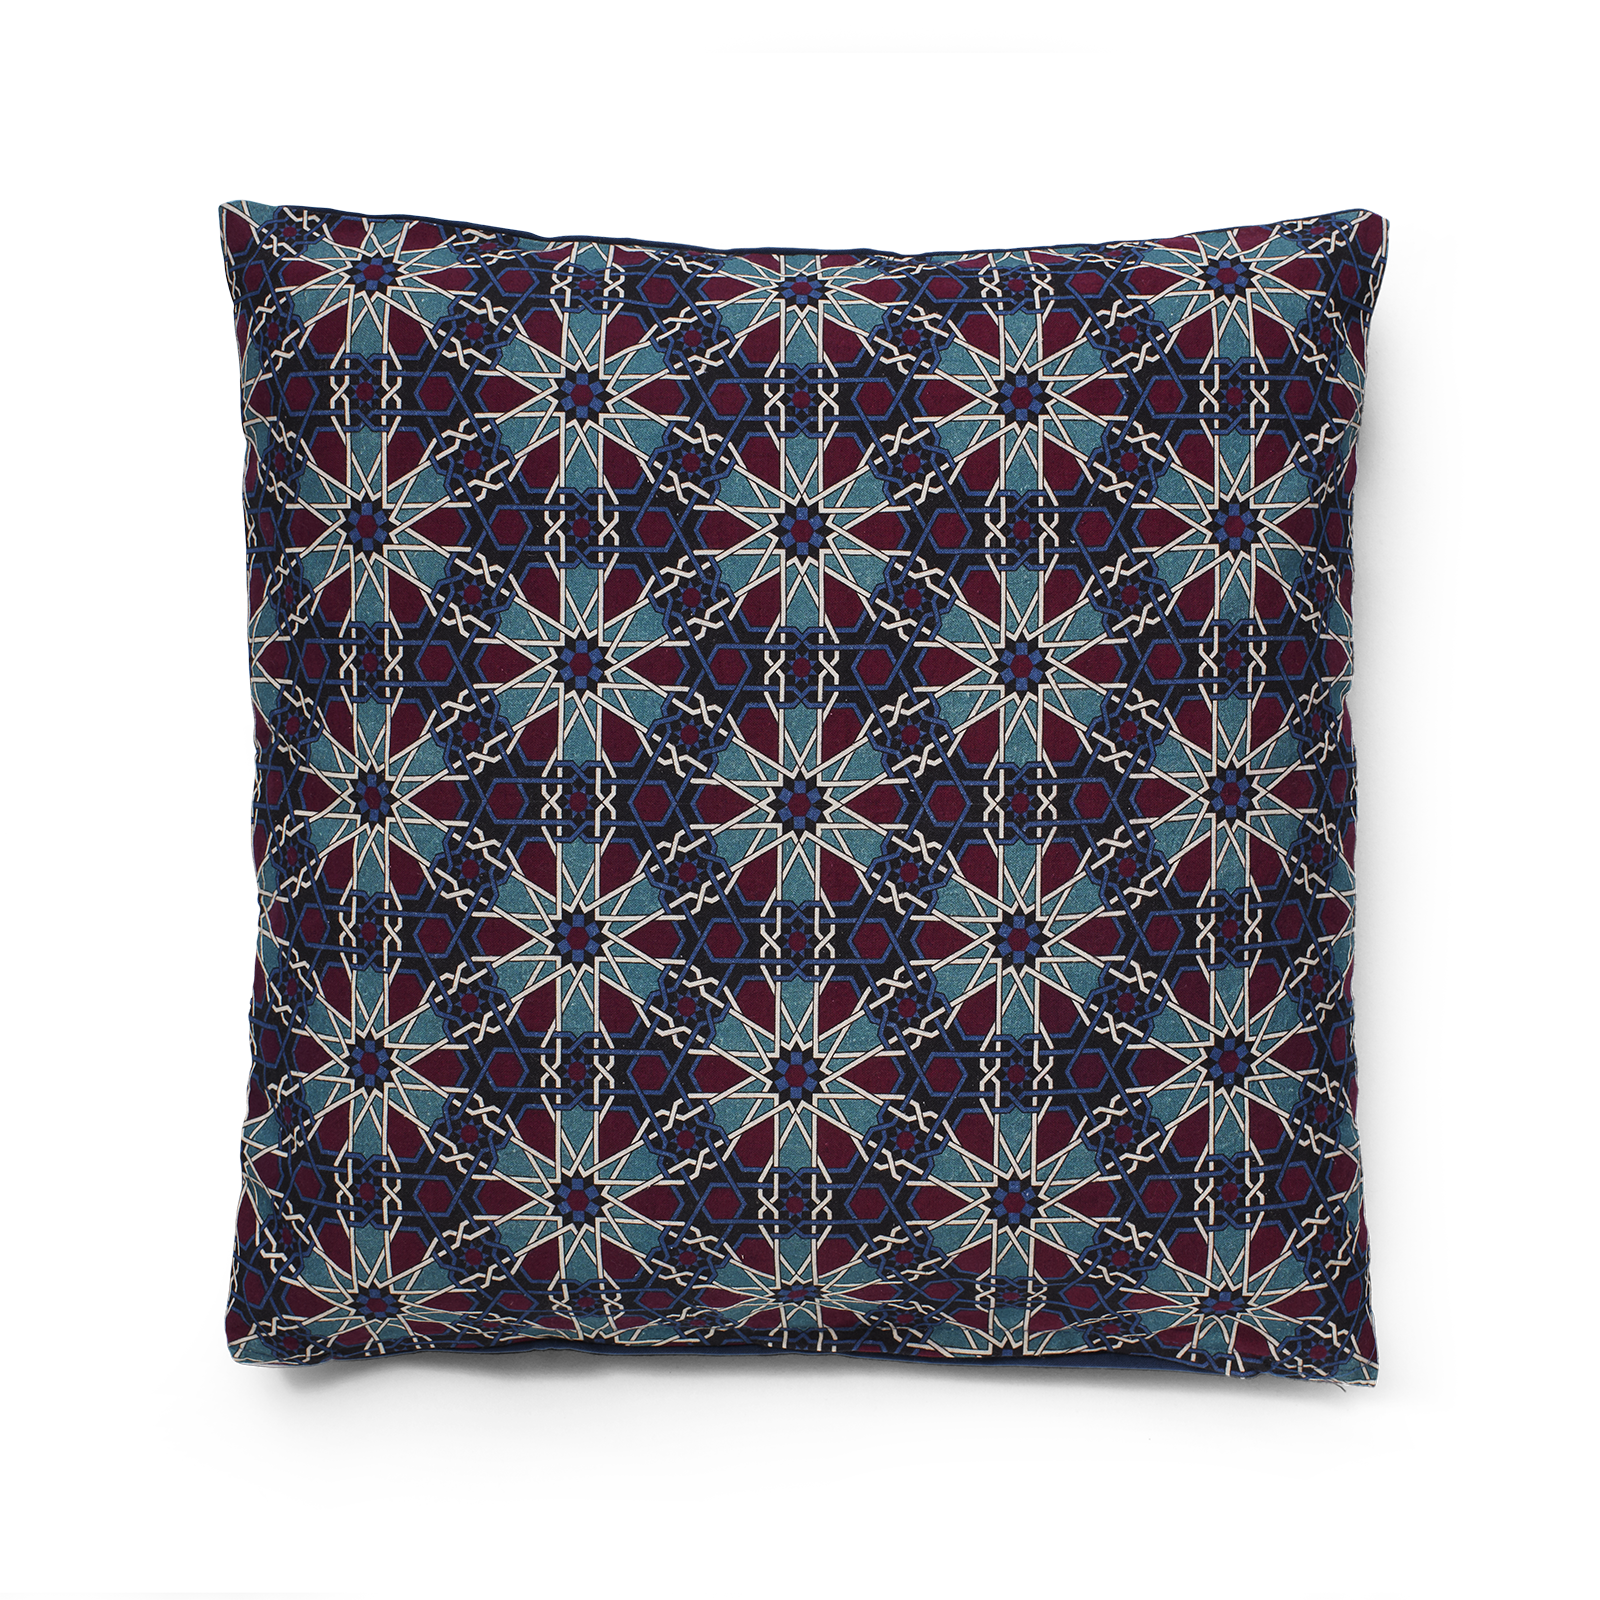 Calay star pillow by Bolia design team